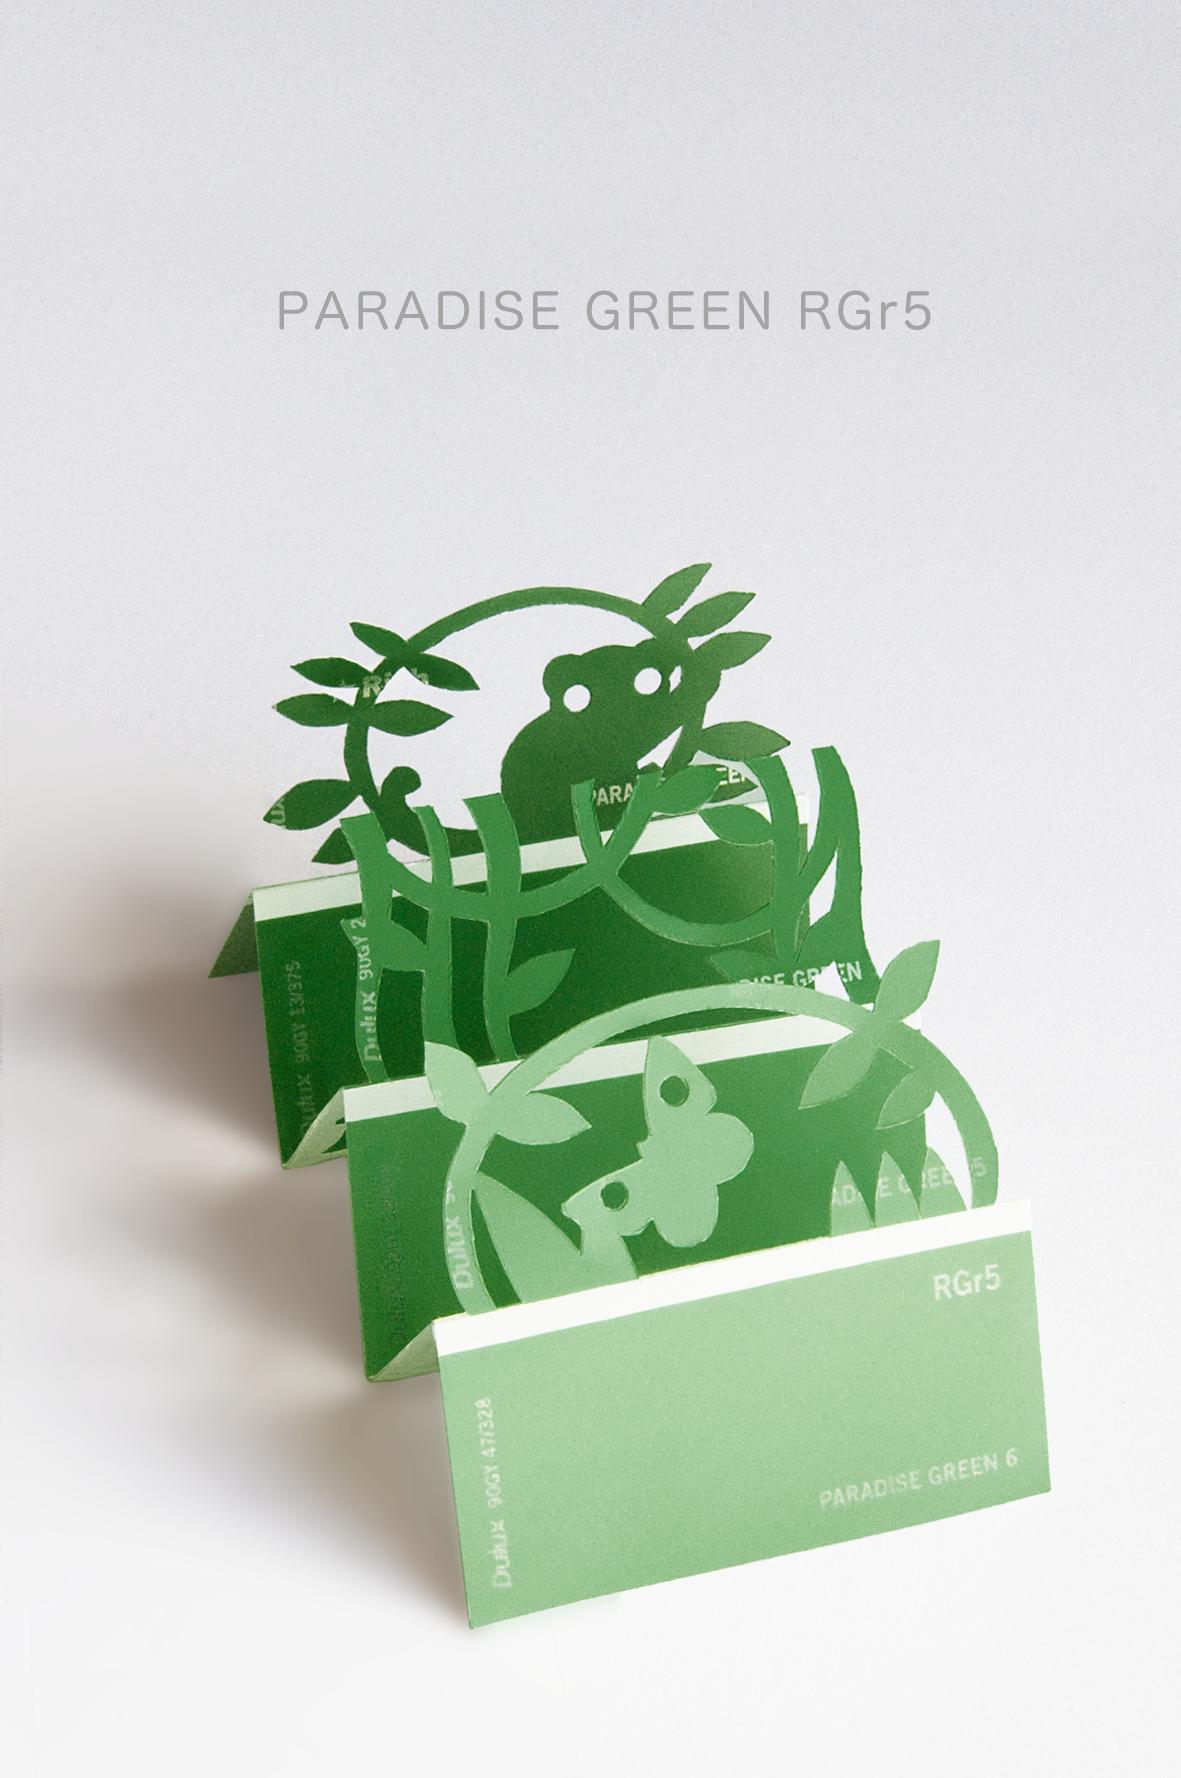 PARADISE GREEN RGr5